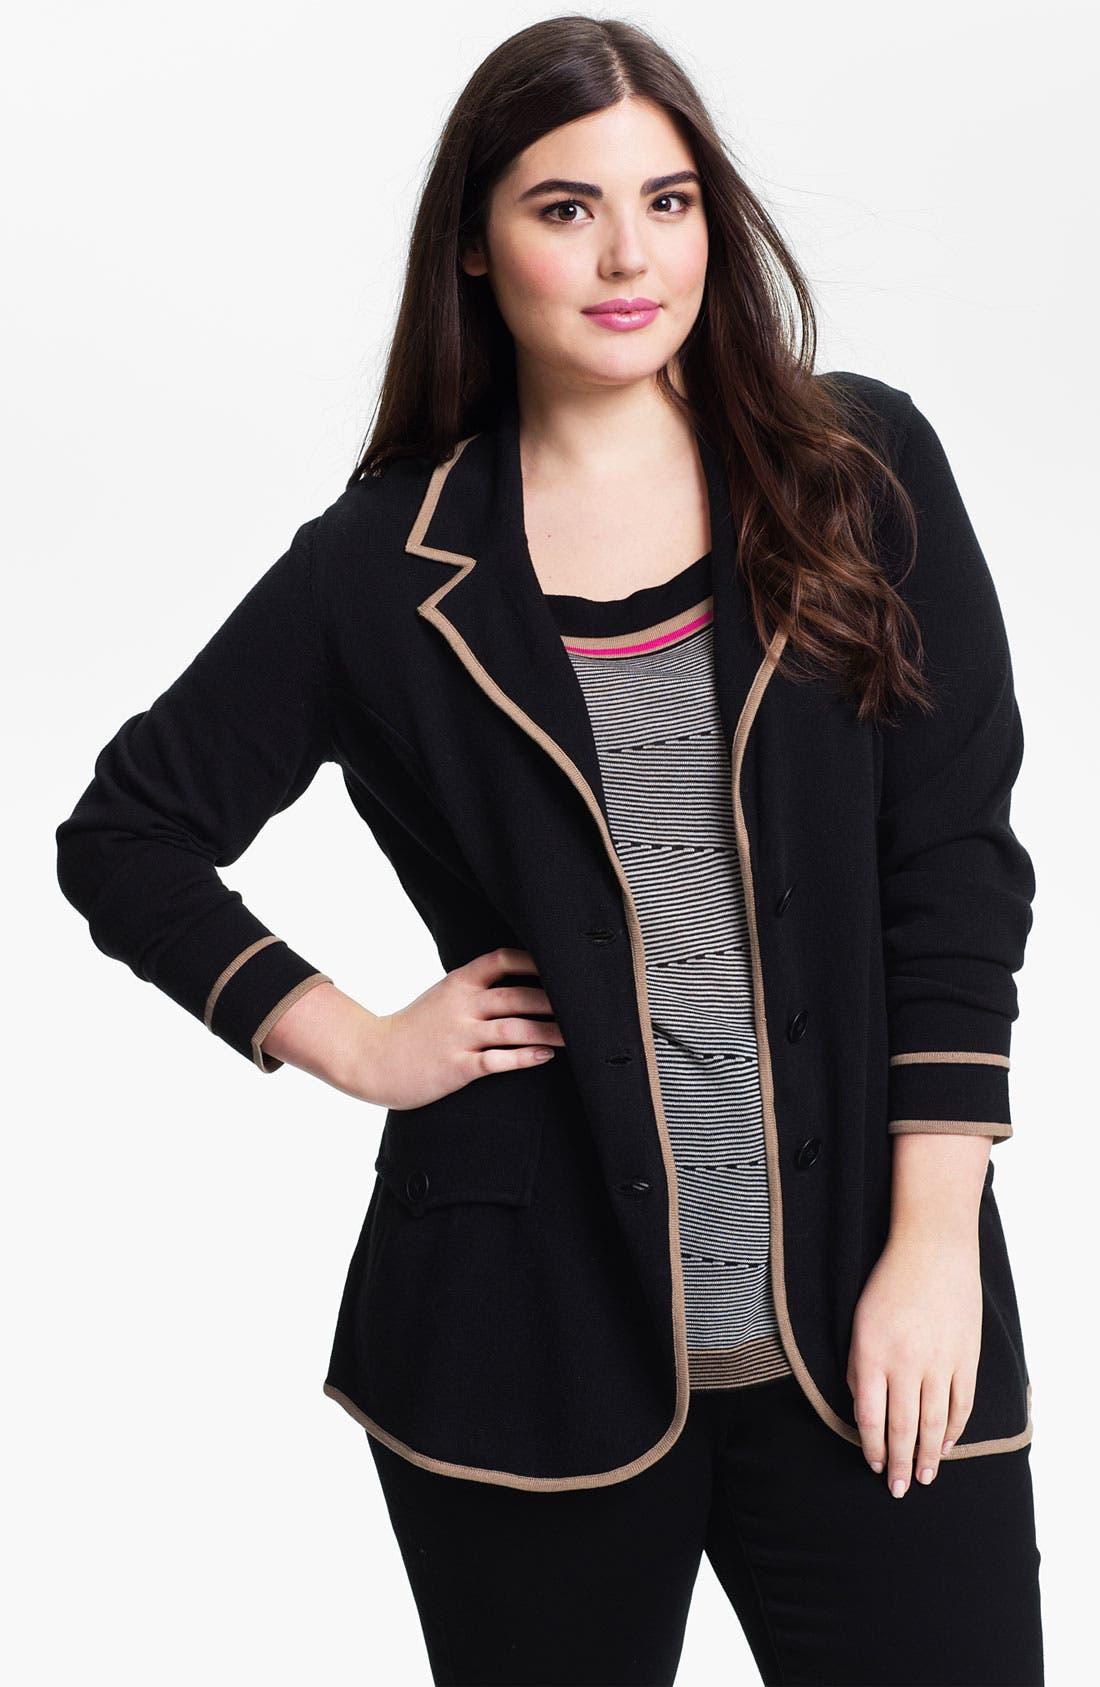 Alternate Image 1 Selected - Nic + Zoe Tipped Knit Jacket (Plus)